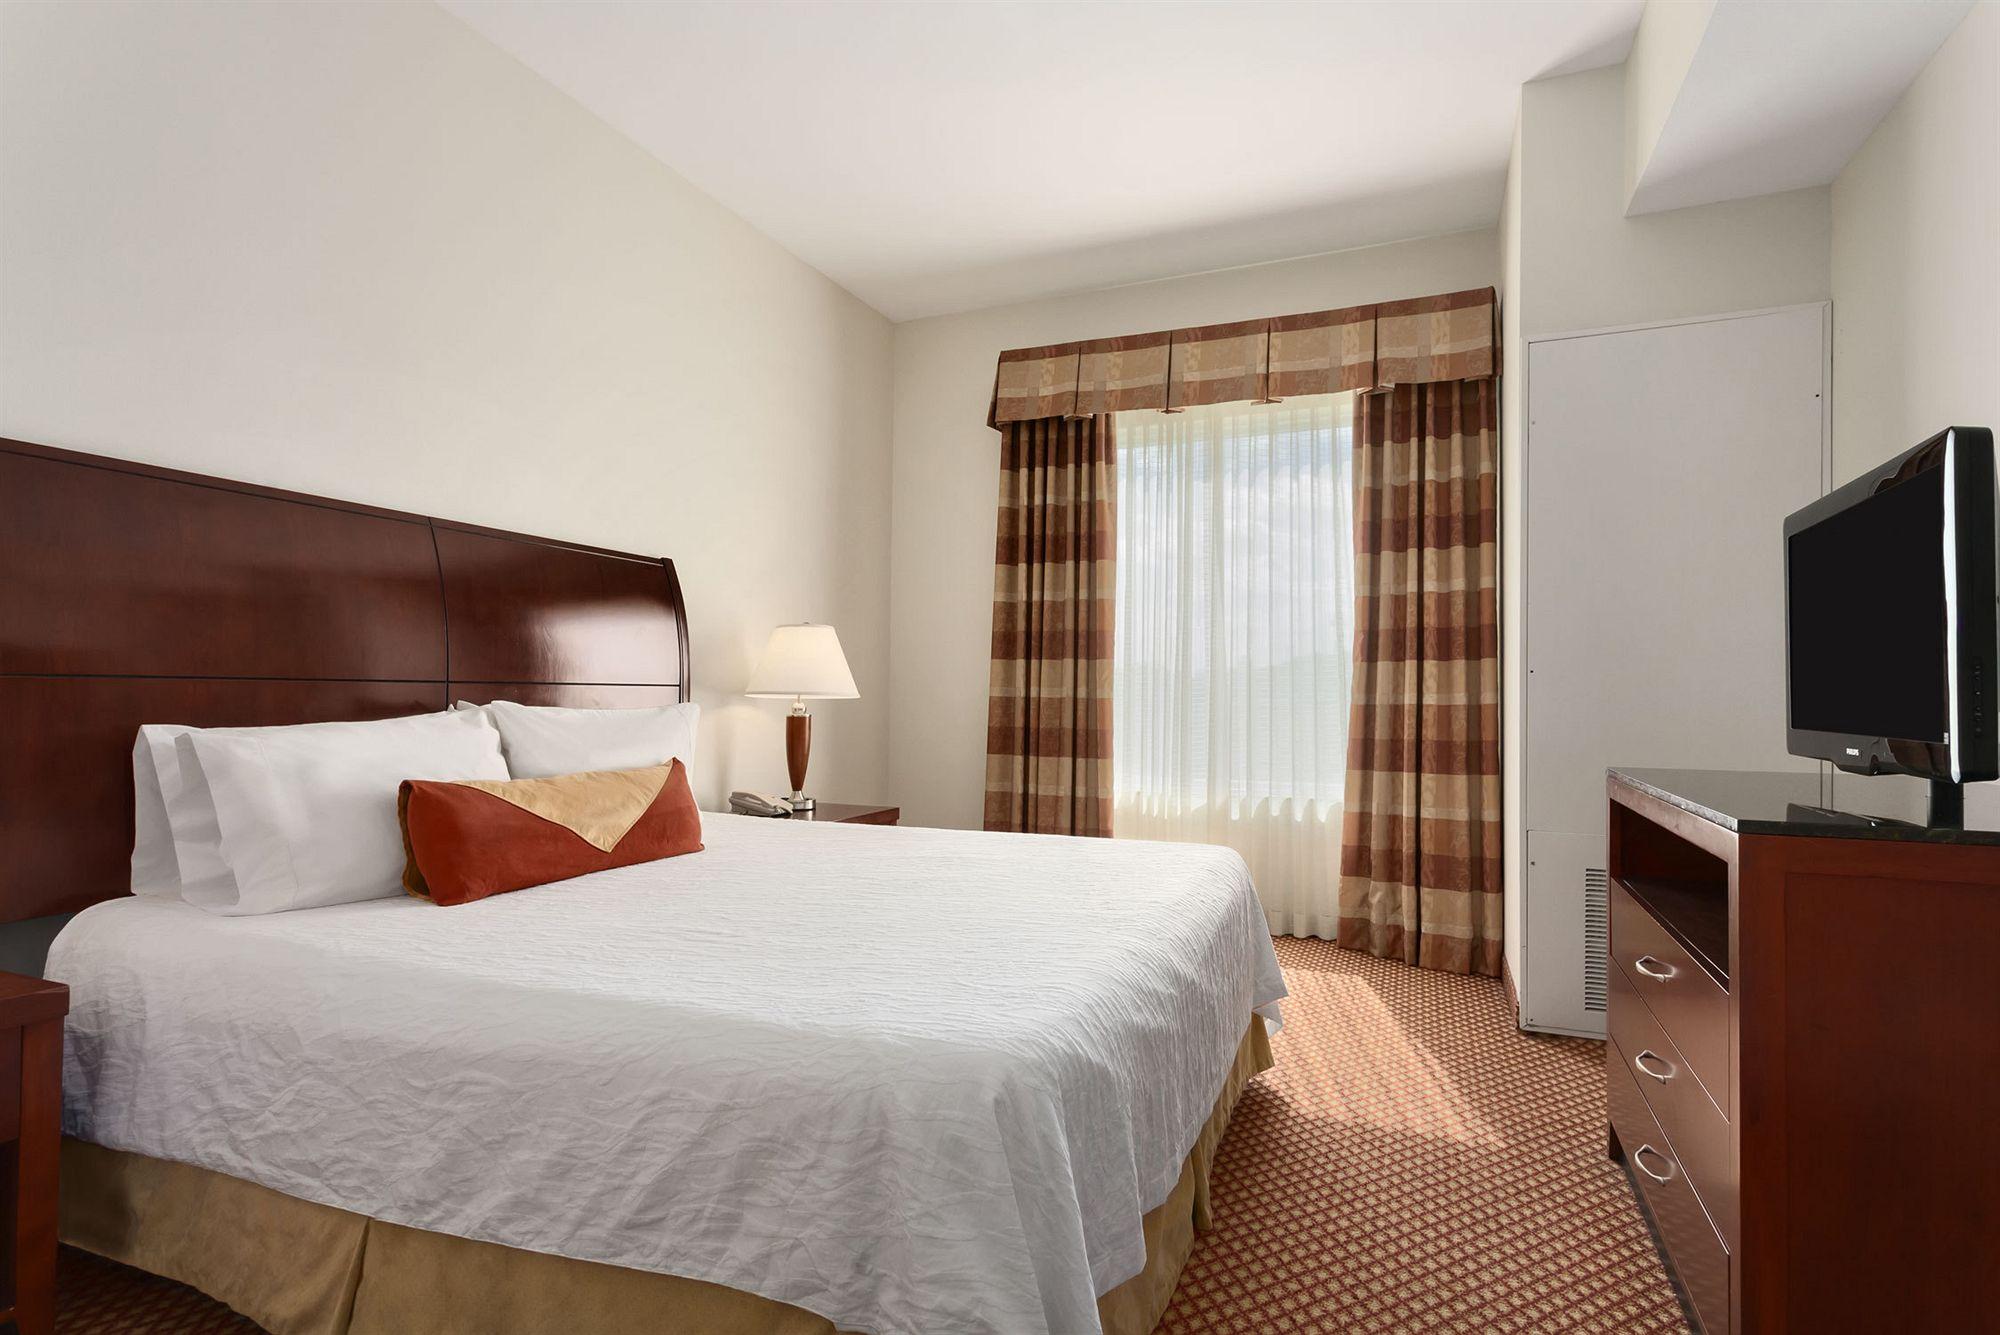 Discount Coupon For Hilton Garden Inn Corpus Christi In Corpus